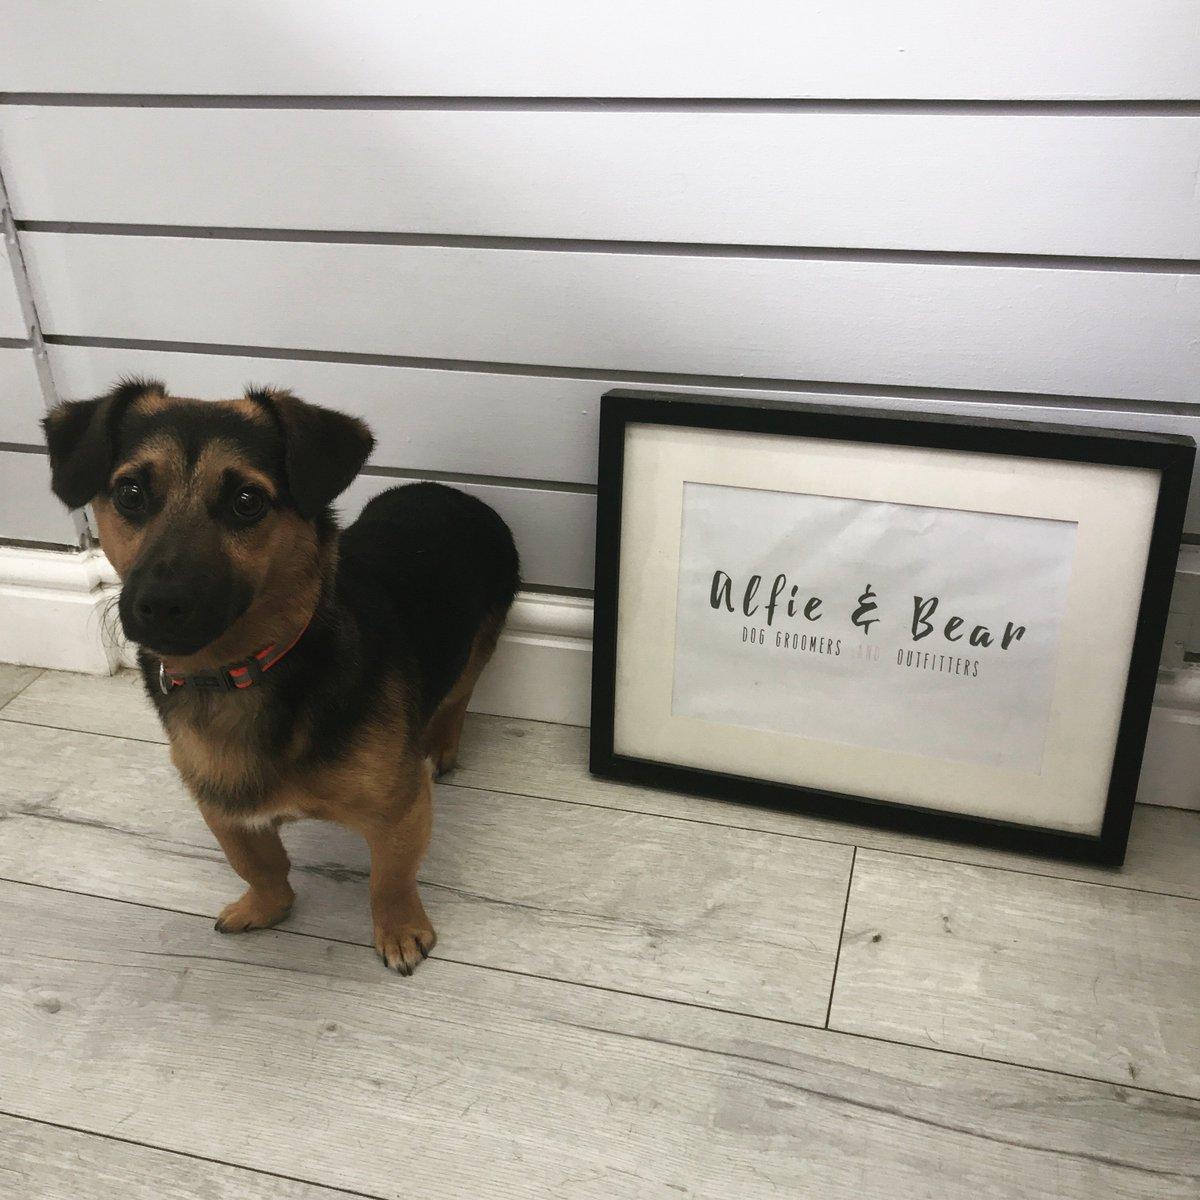 We Met The Lovely Vaz This Week    #DogGroomer #DogGrooming #JackRussell #DogSpa #DogGroomingSalon #DogOfTheDay  #DogsOfTwitter #DogLovers #NEFollowers #NewcastleUponTyne<br>http://pic.twitter.com/ntIN98GejL